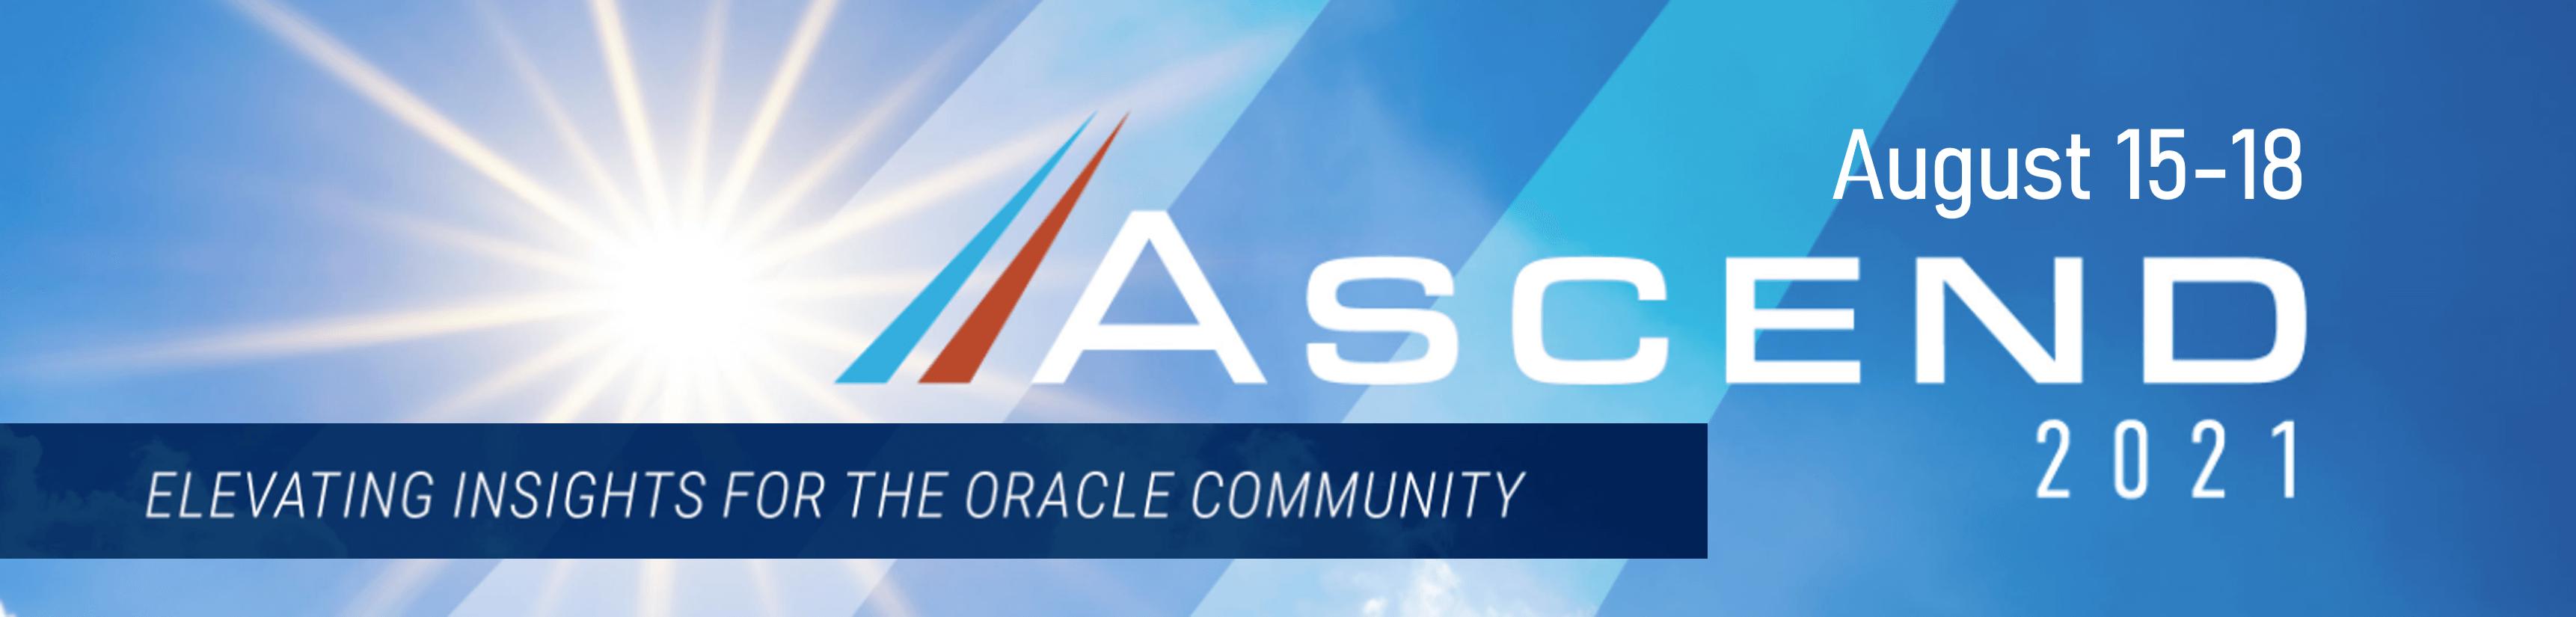 Ascend 2021 Conference